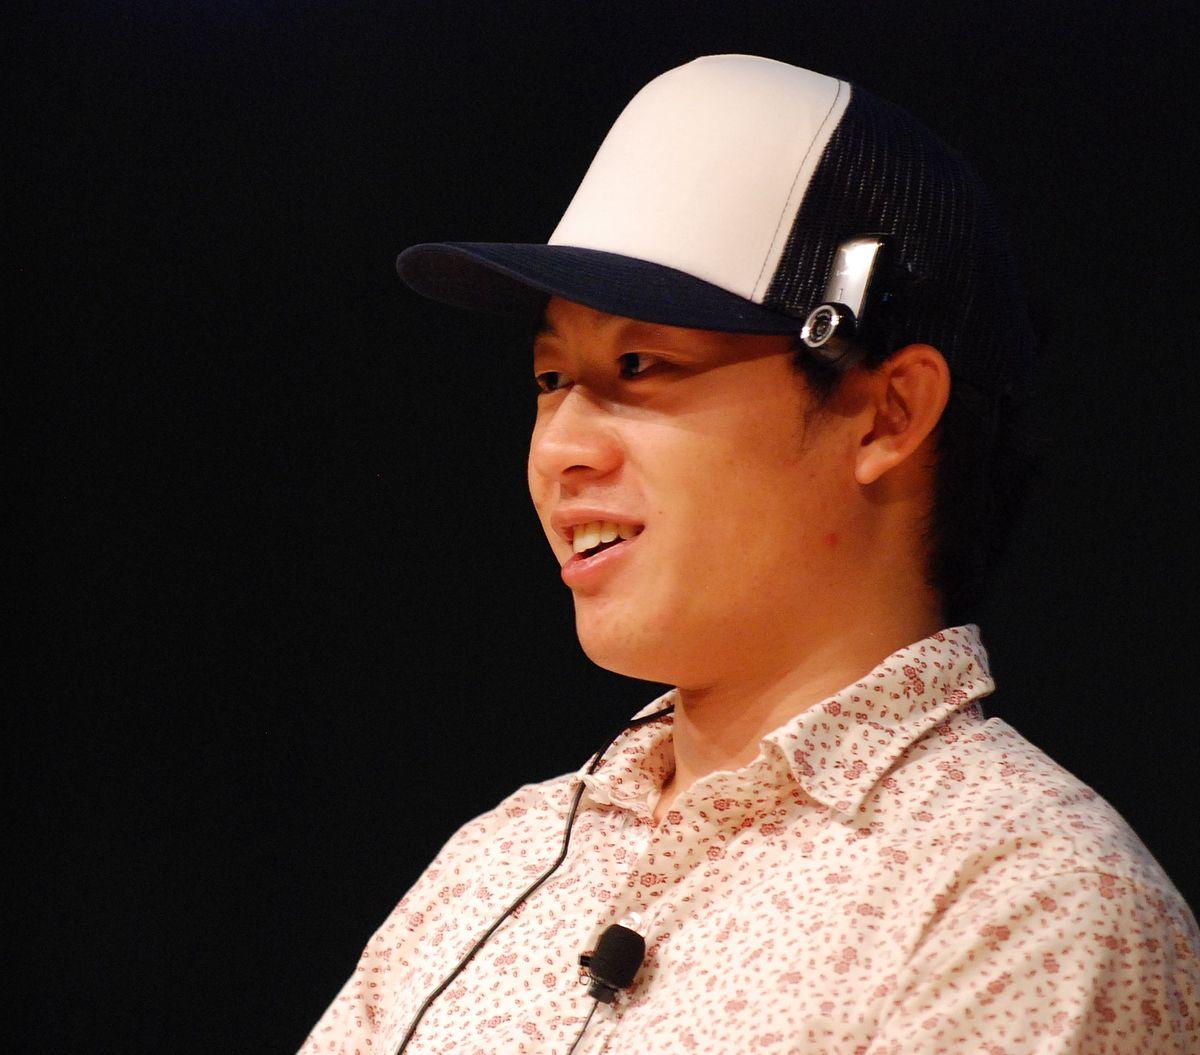 Justin Kan - Wikipedia